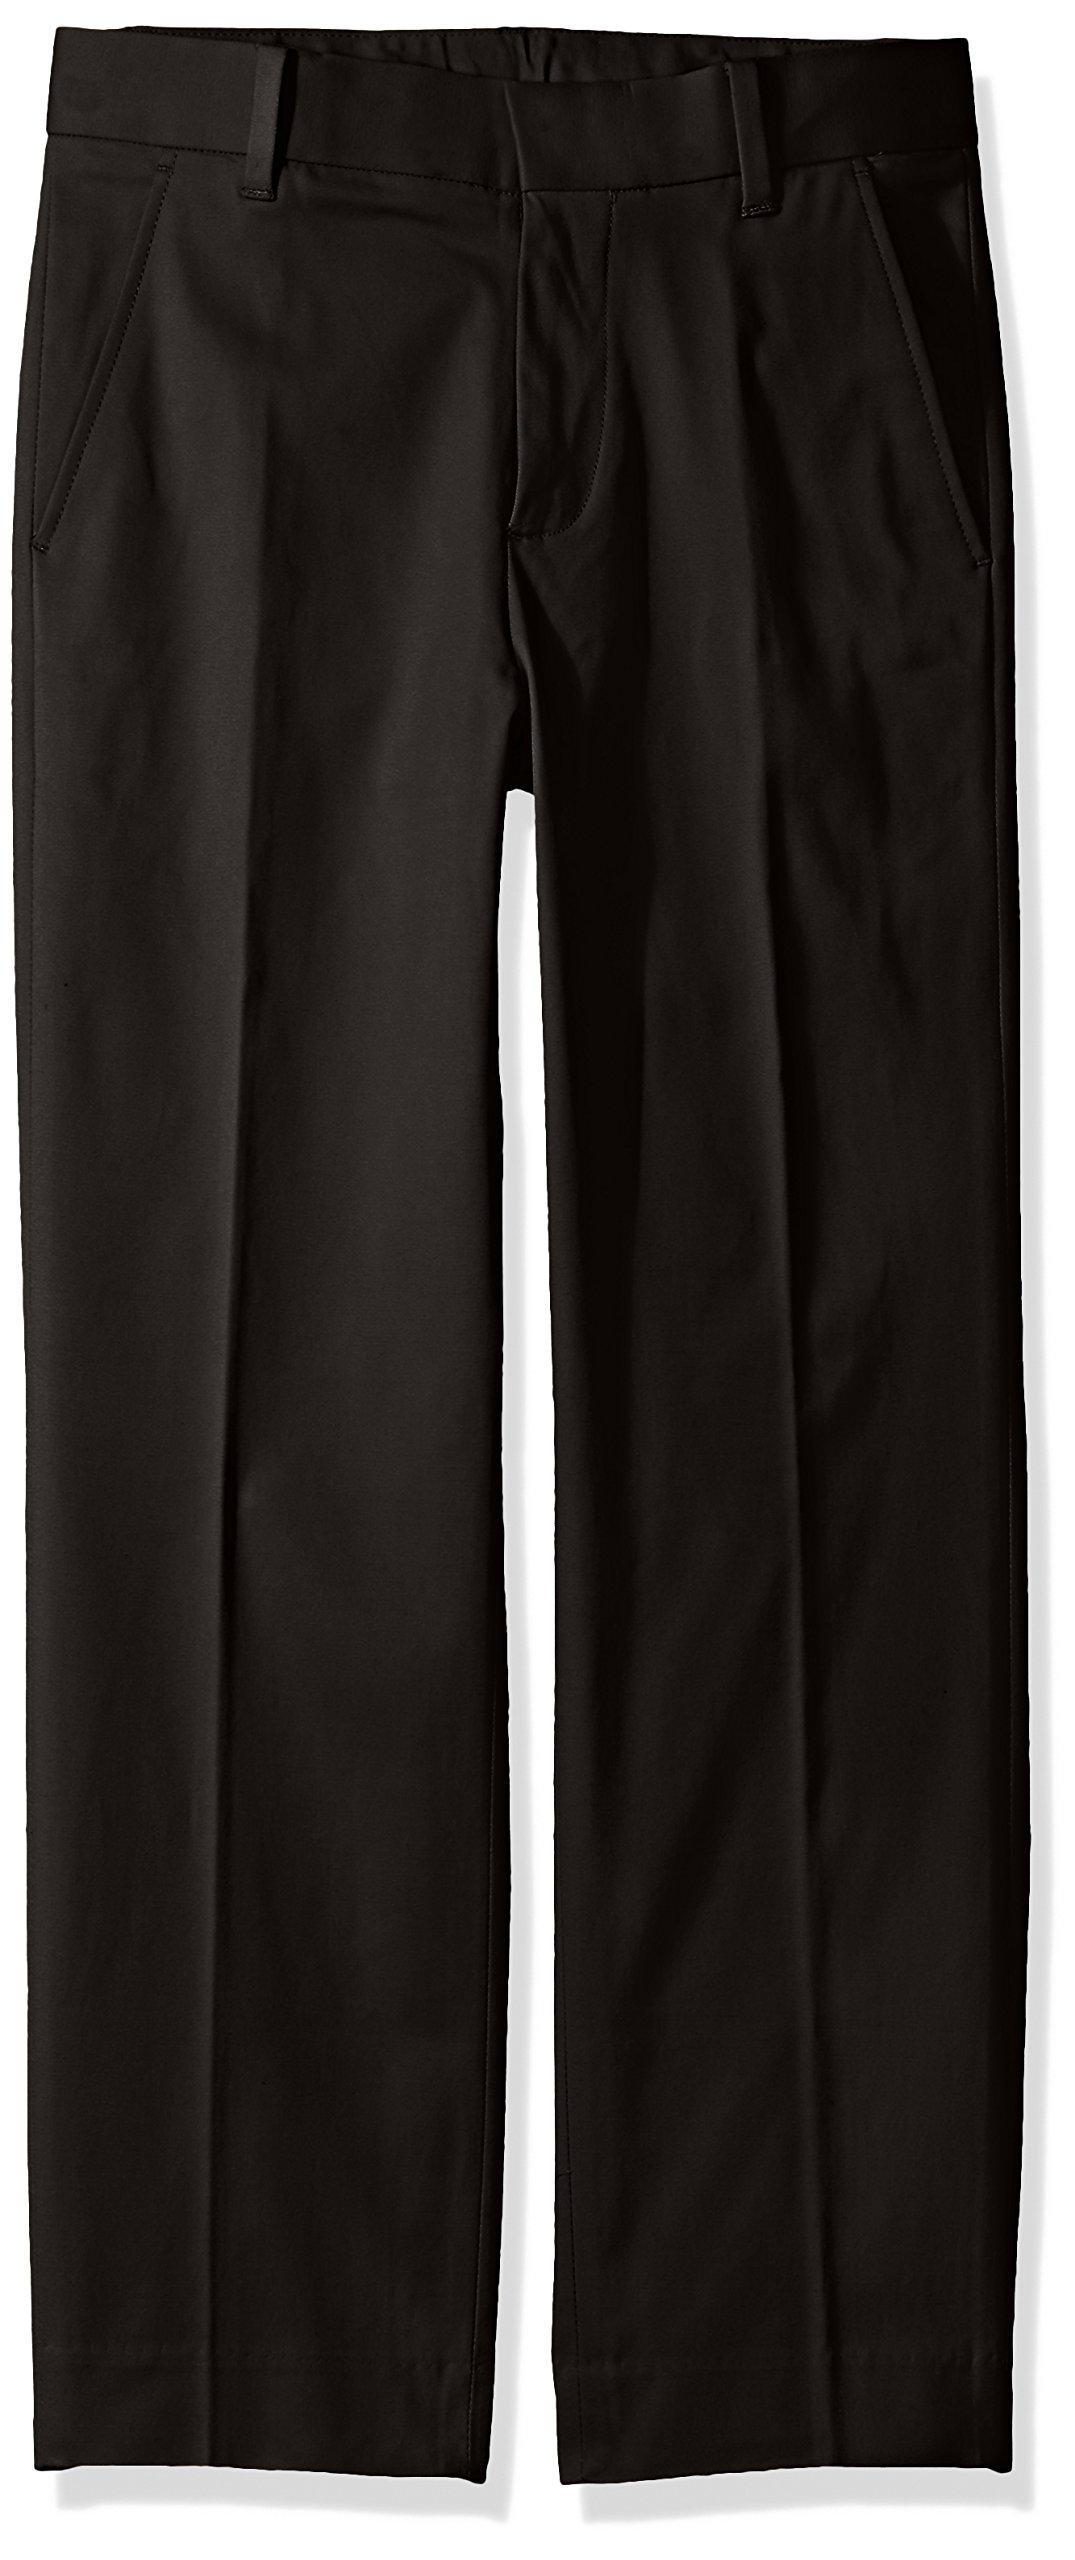 Calvin Klein Little Boys' Fine Line Stretch Twill Pant, Black, 6